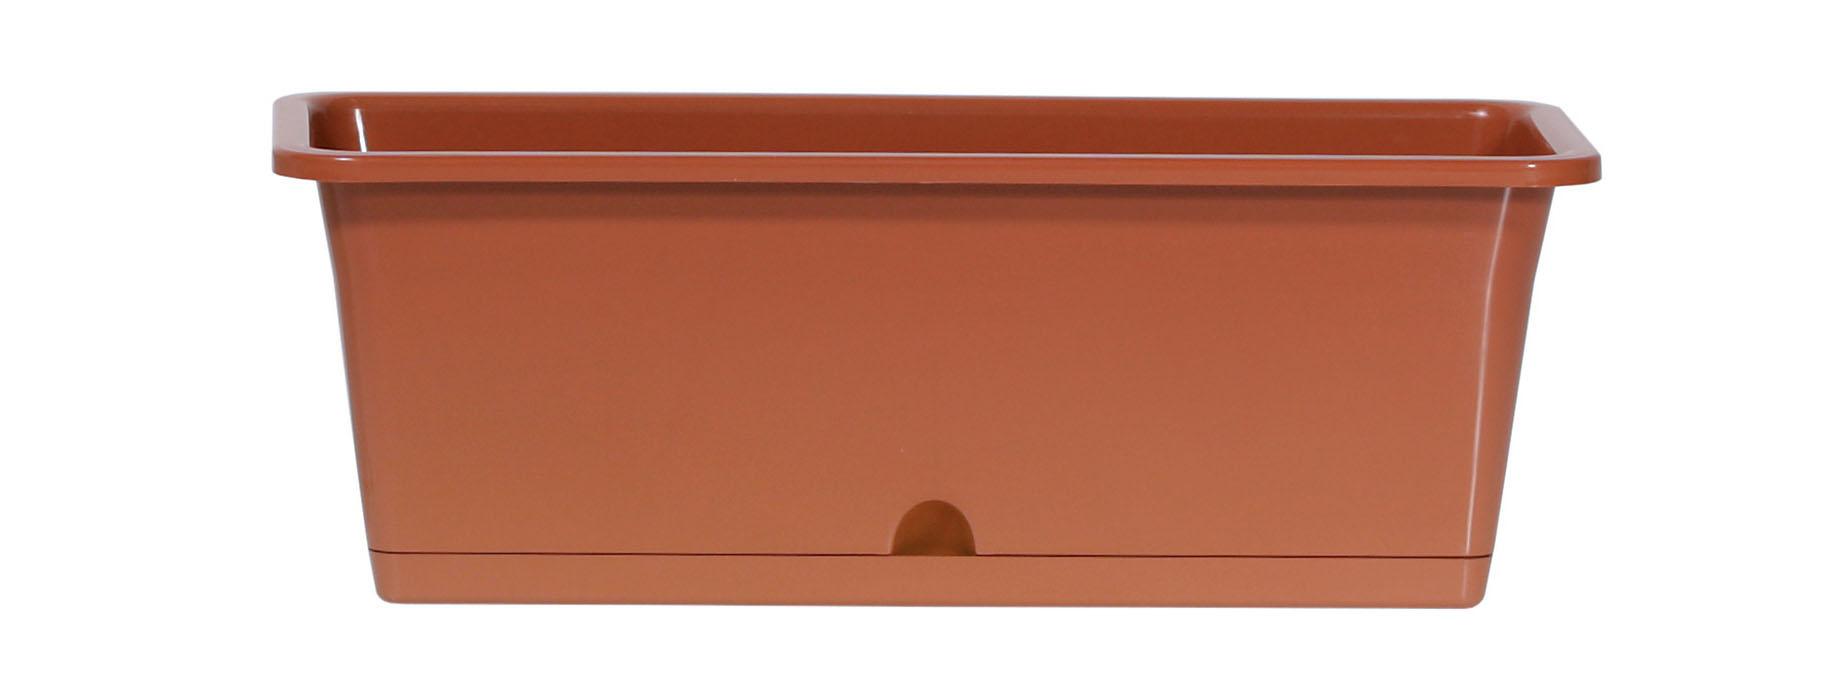 PROSPERPLAST Truhlík CAMELIA terakota 40,2cm